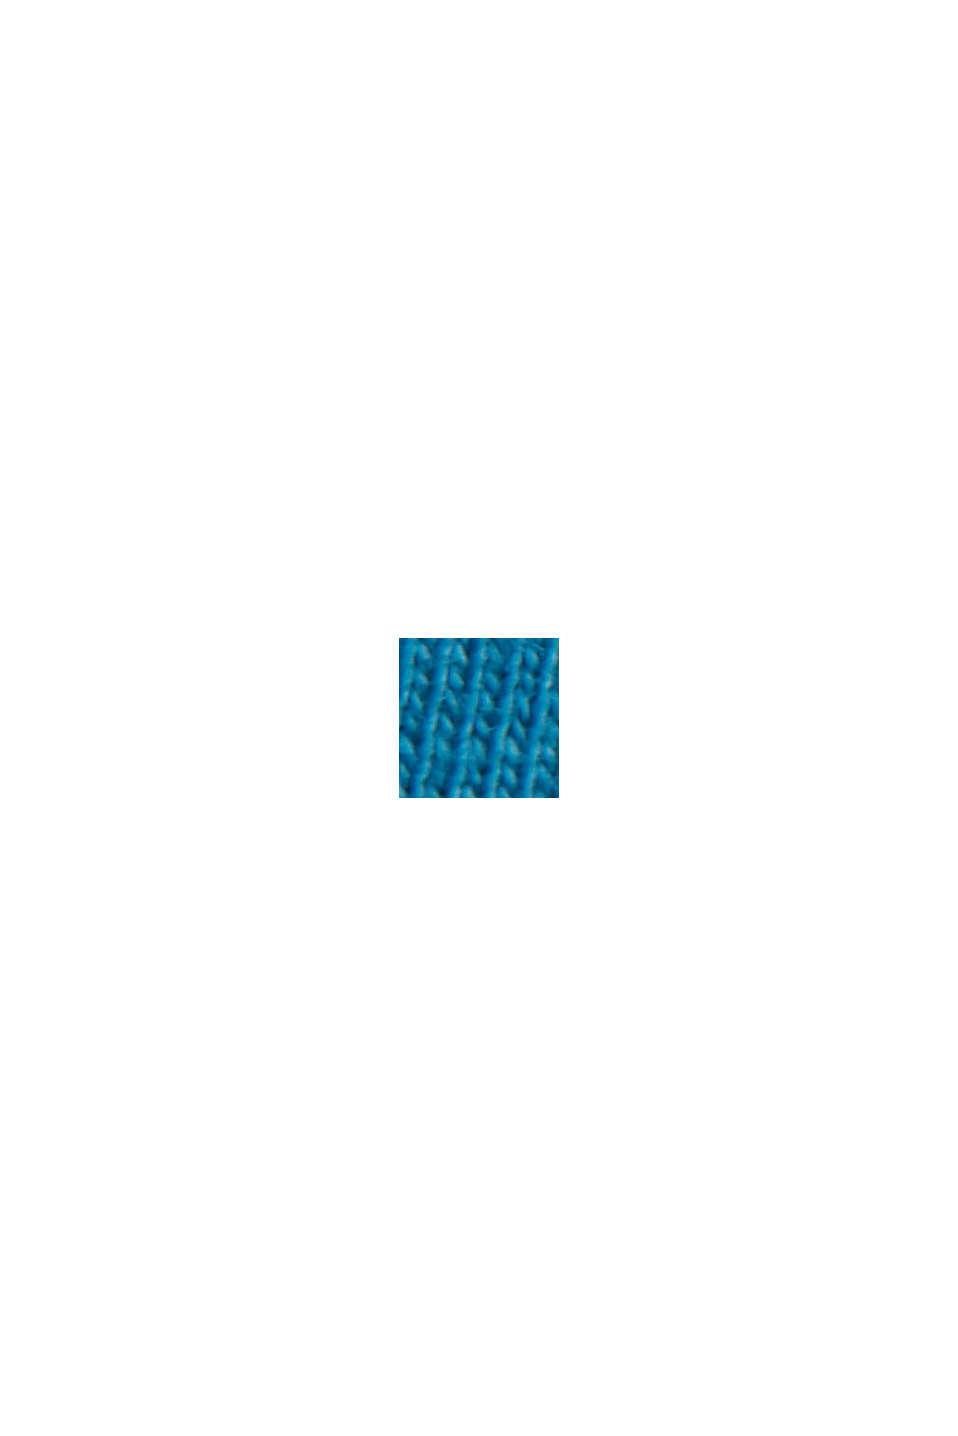 Jersey T-shirt van 100% biologisch katoen, PETROL BLUE, swatch